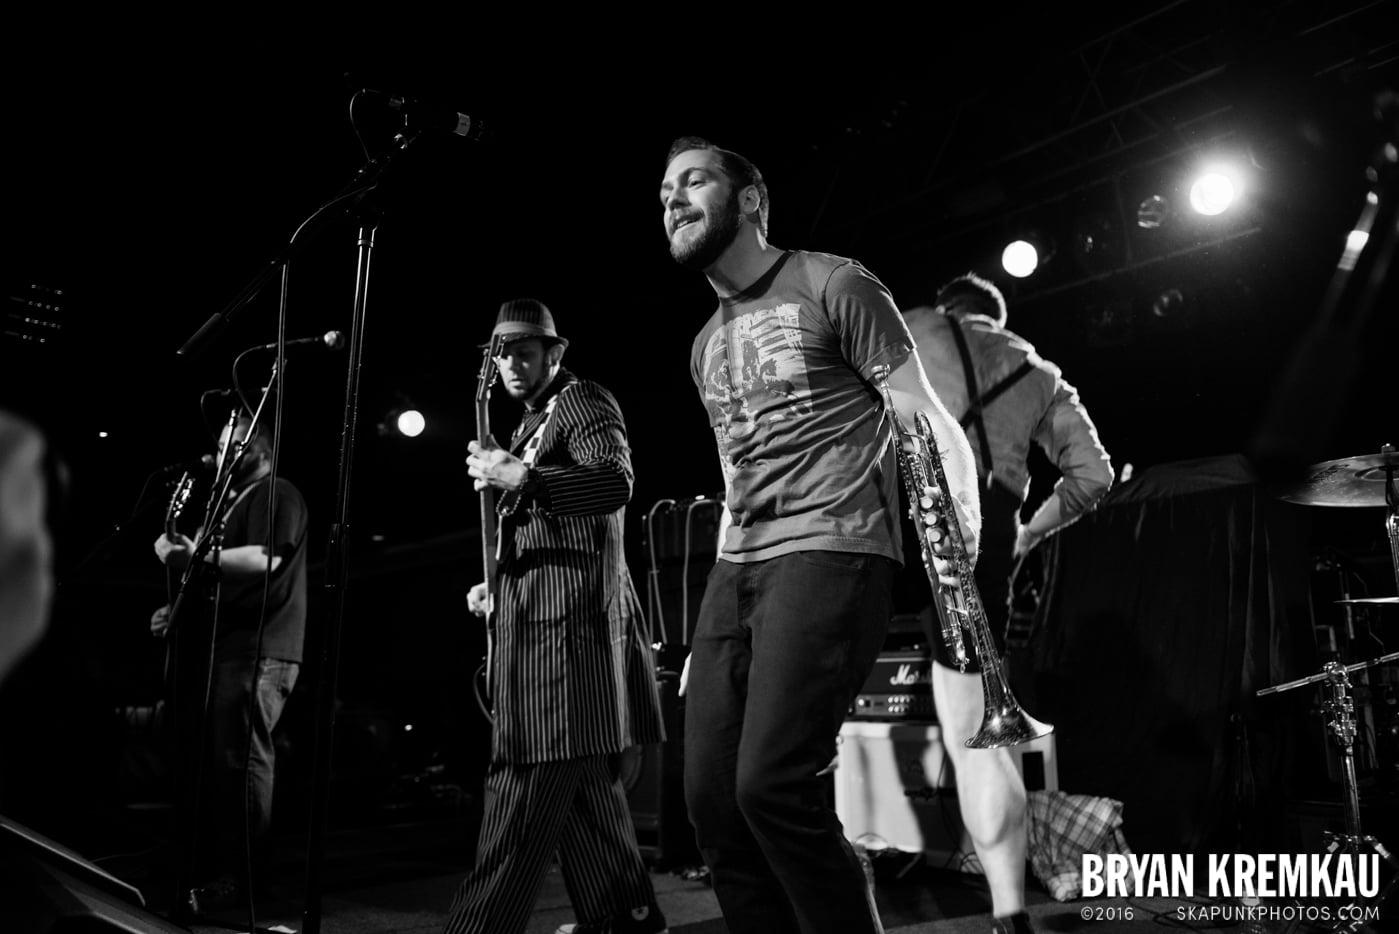 Backyard Superheroes @ Starland Ballroom, Sayreville, NJ - 11.9.13 (7)